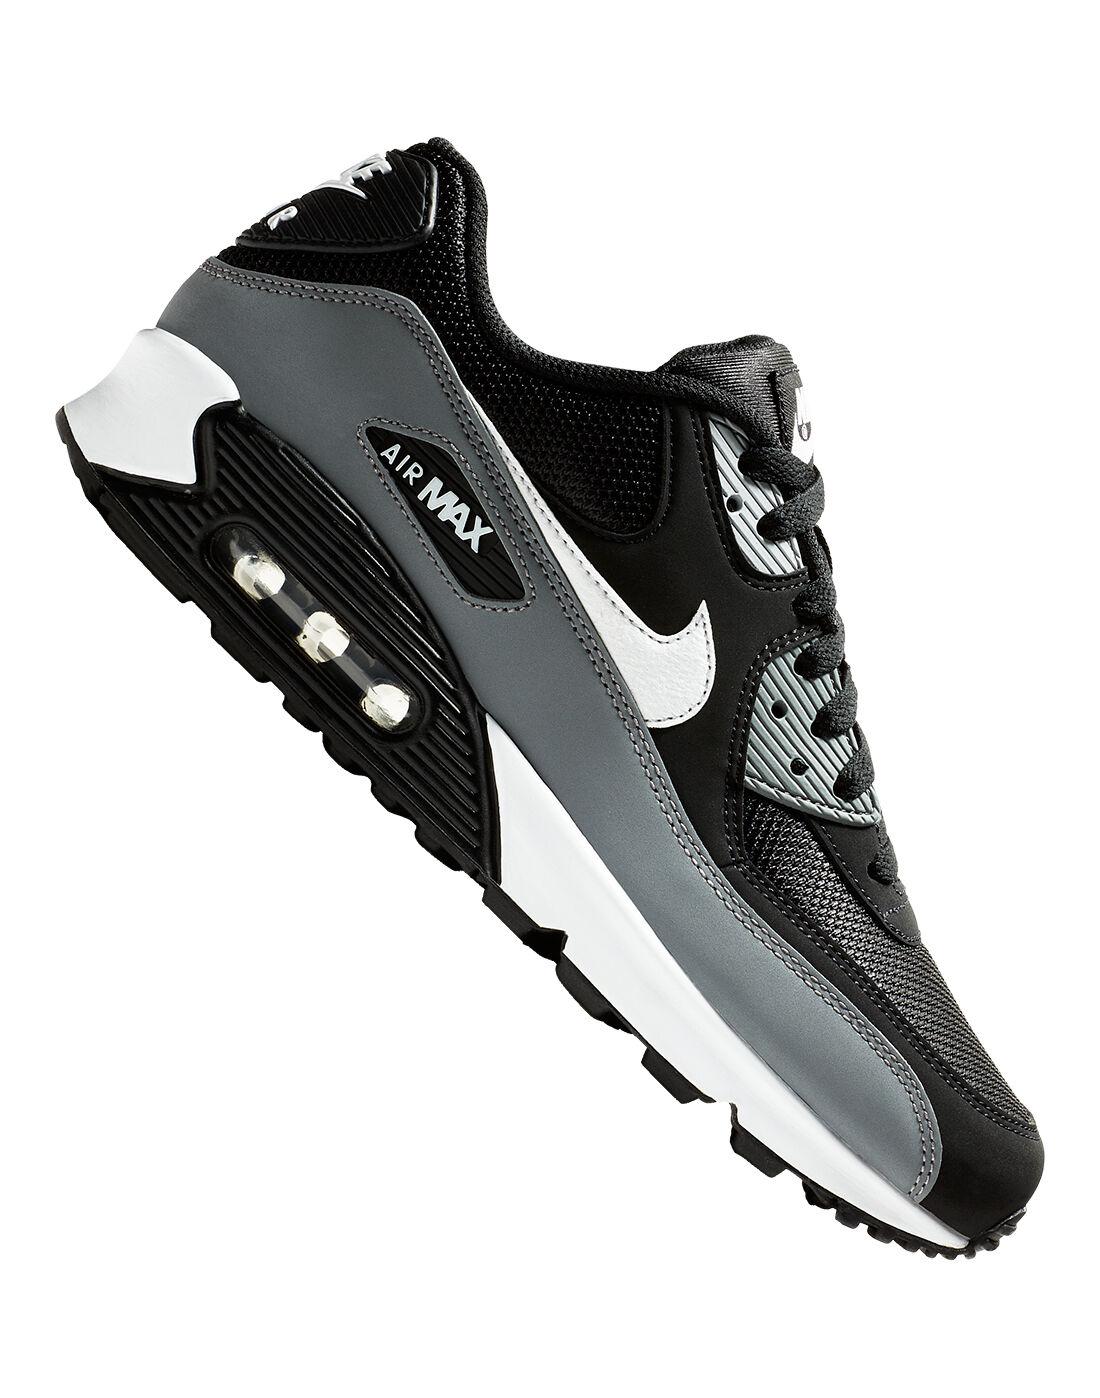 Men's Black & Grey Nike Air Max 90 Essential | Life Style Sports